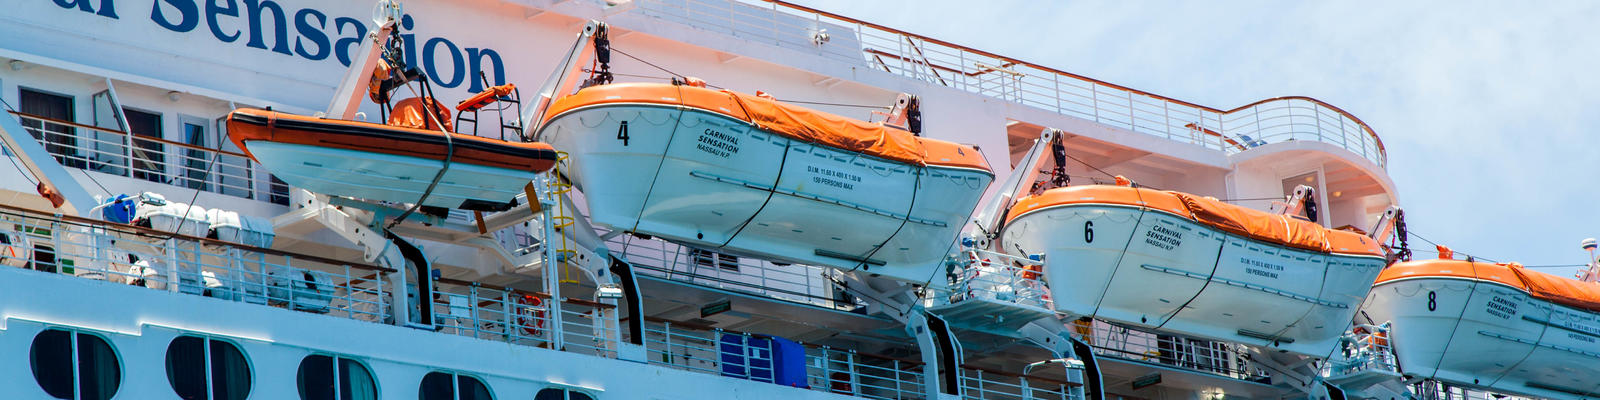 Lifeboats on Carnival Sensation (Photo: Cruise Critic)